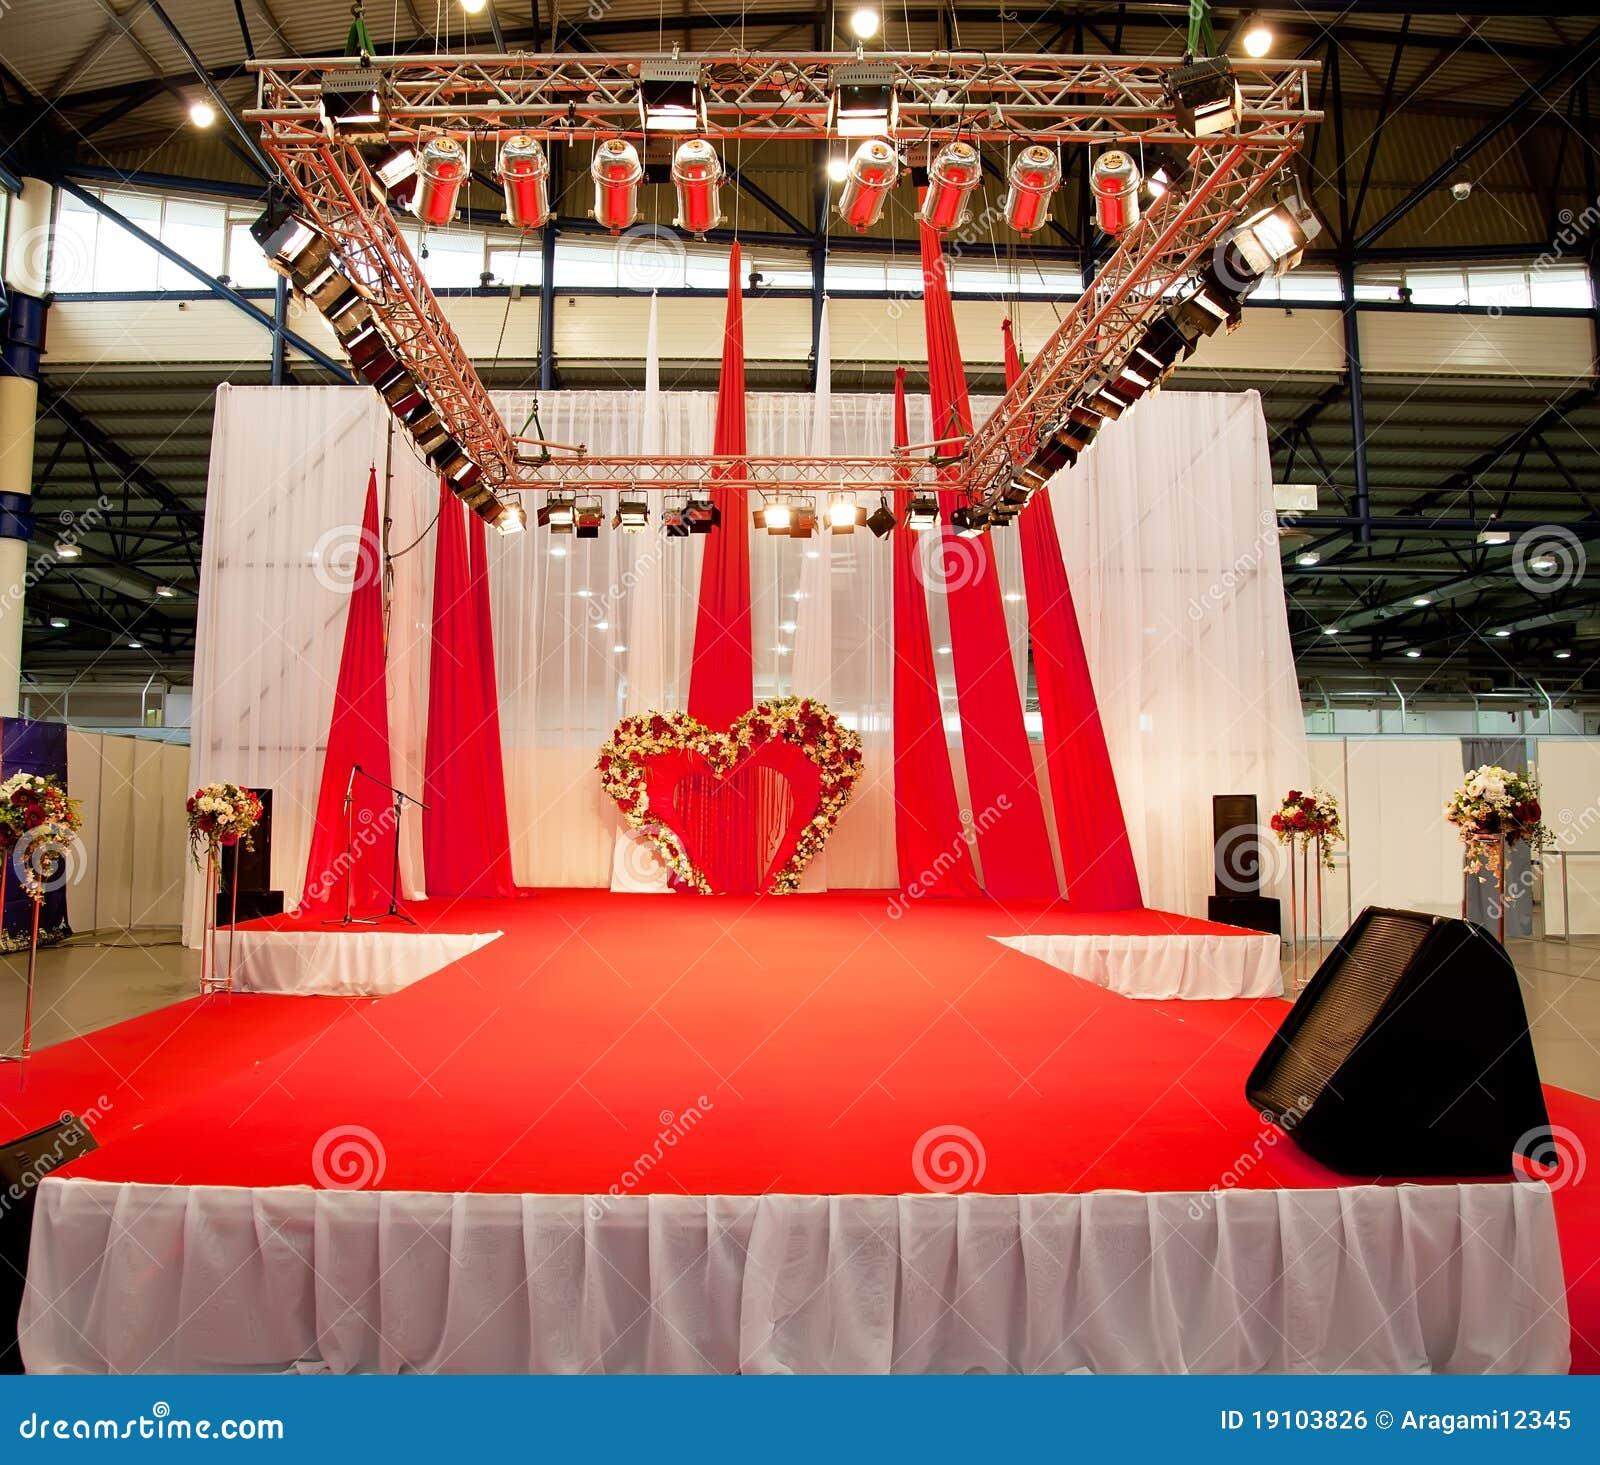 podiume de mariage couvert du tapis rouge photo stock. Black Bedroom Furniture Sets. Home Design Ideas